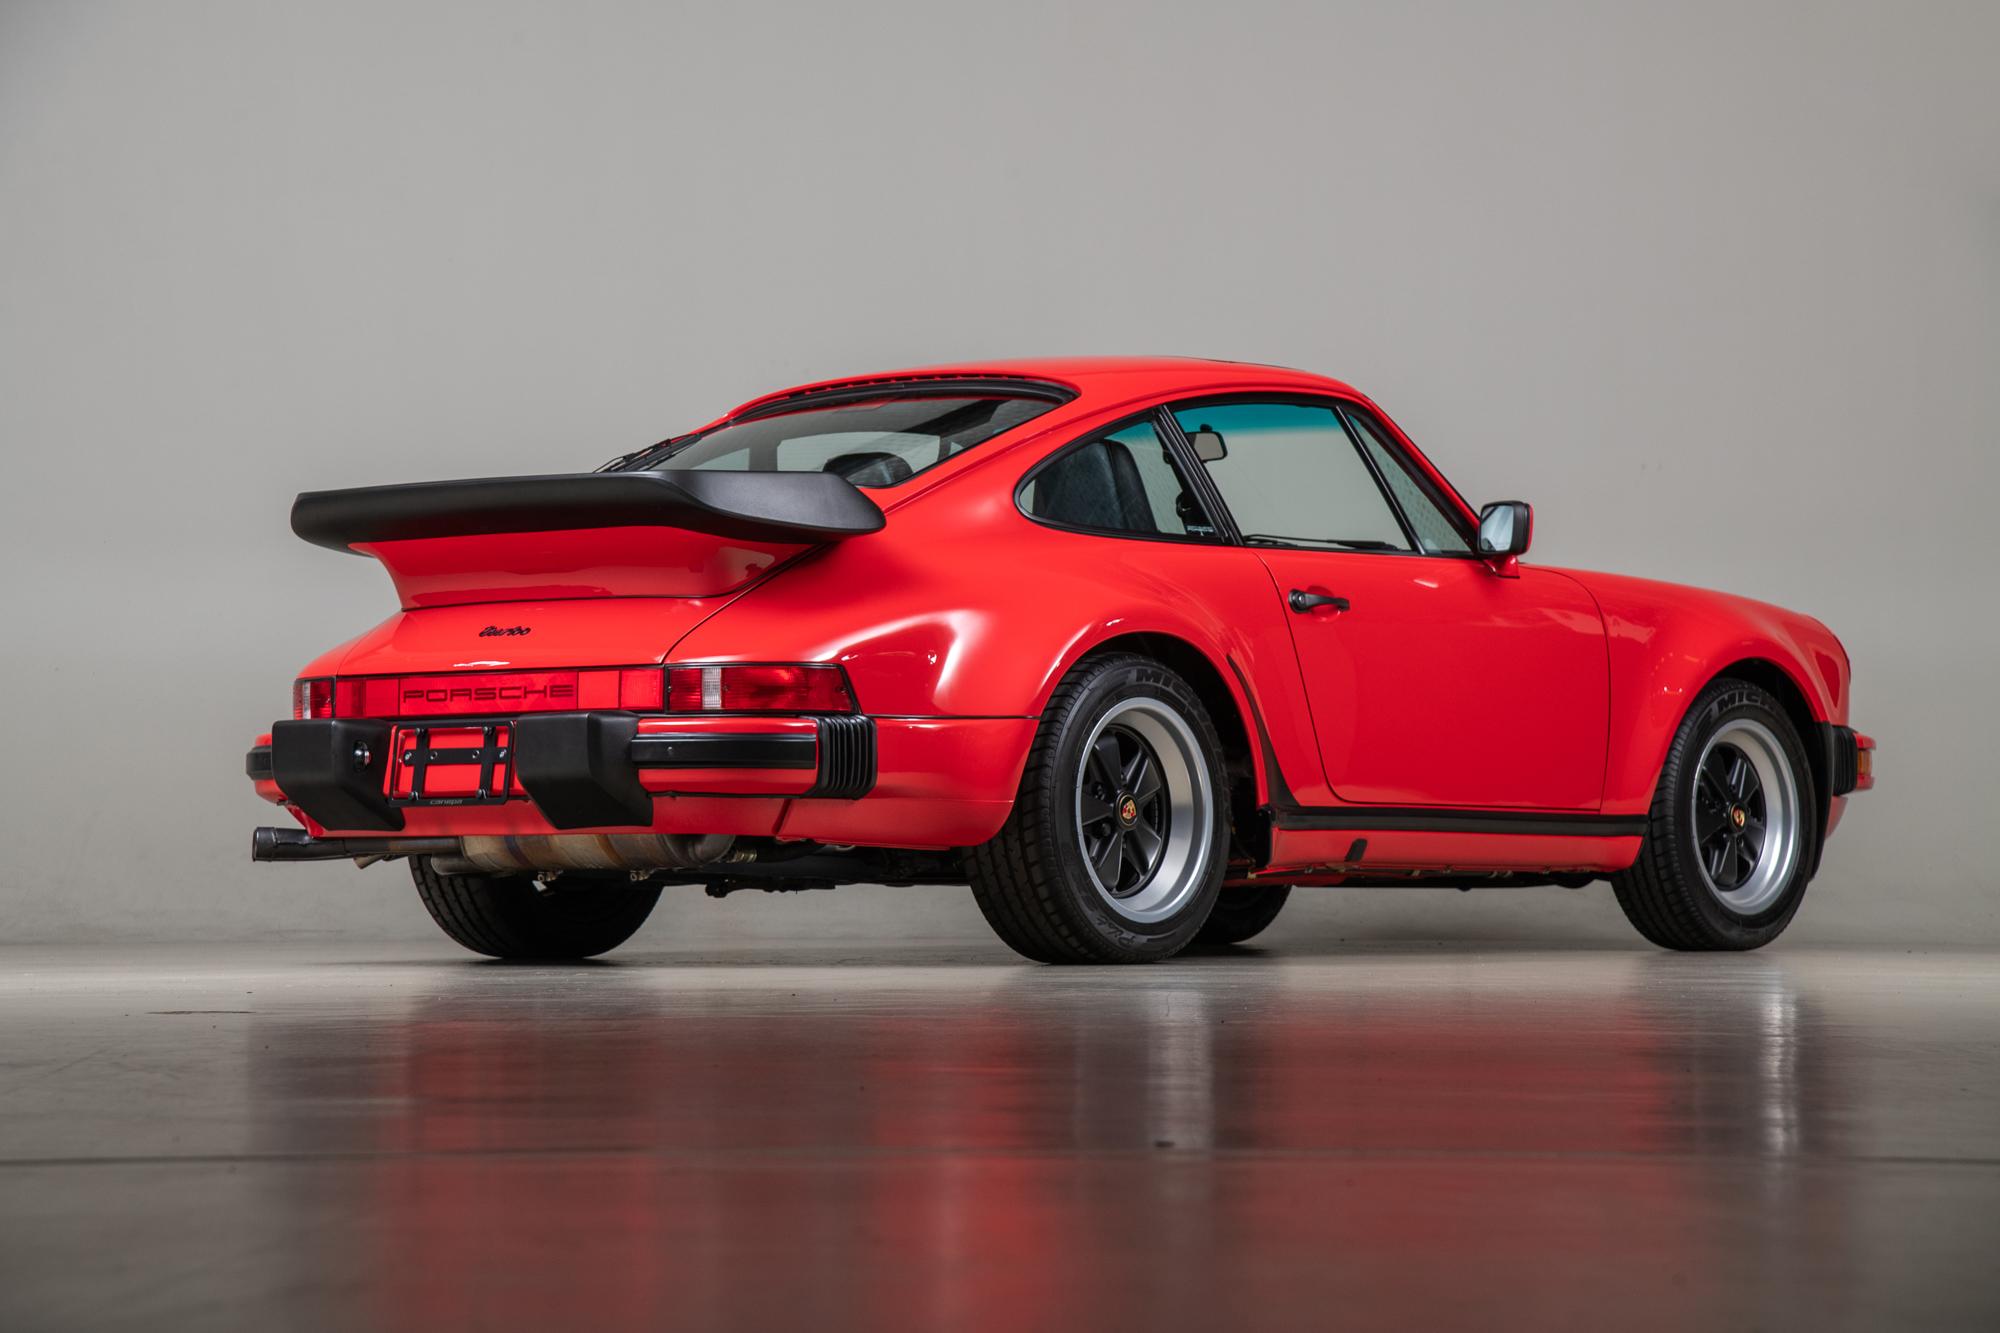 1988 Porsche 911 Turbo, RED, VIN WP0JB0933JS050456, MILEAGE 6747